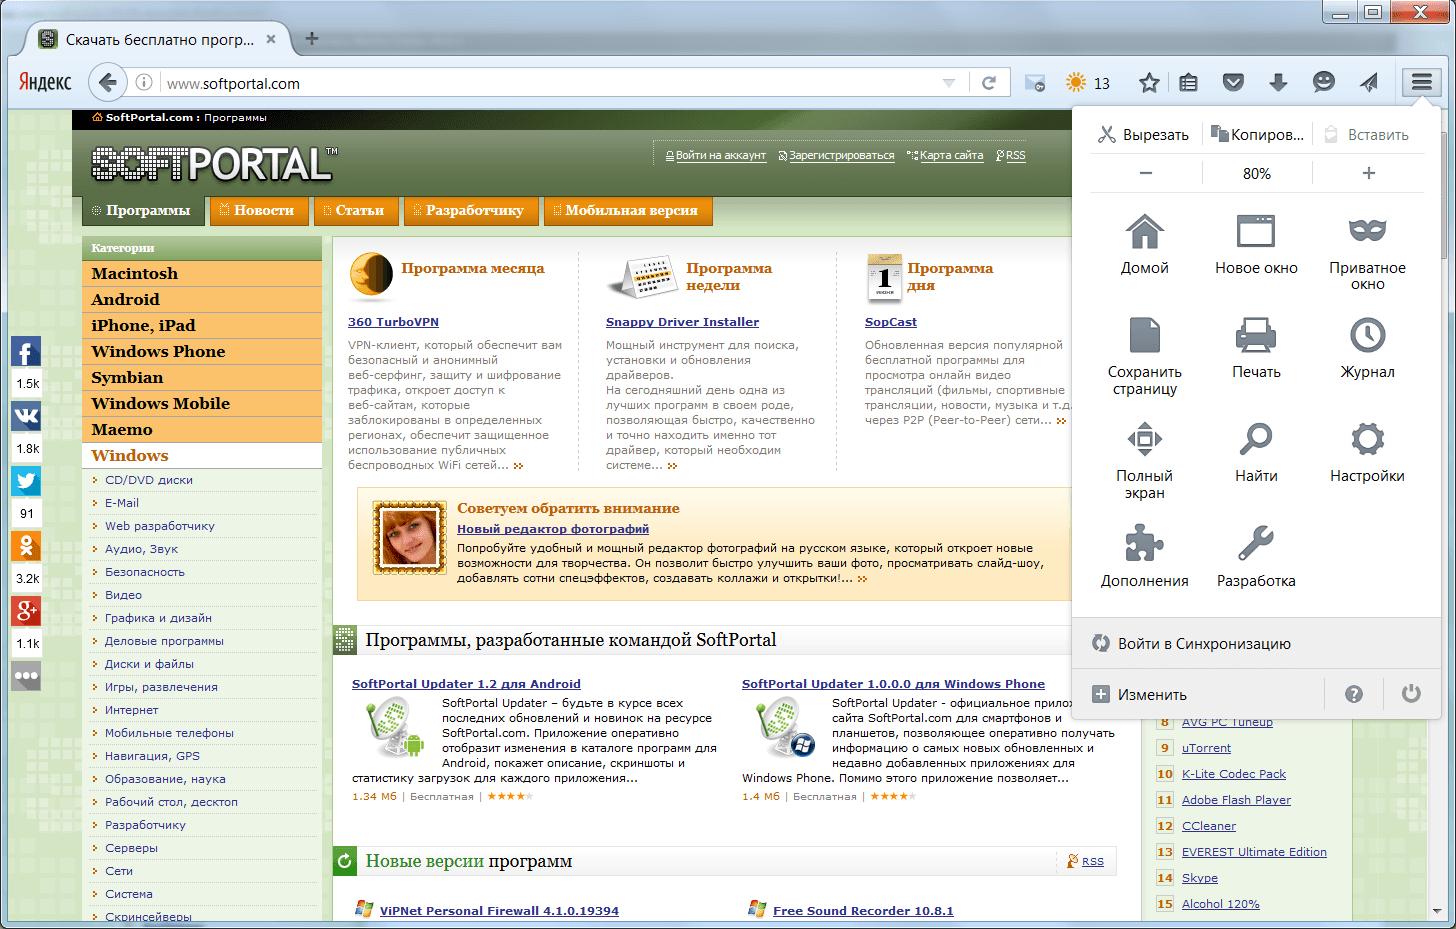 everest x64 softportal